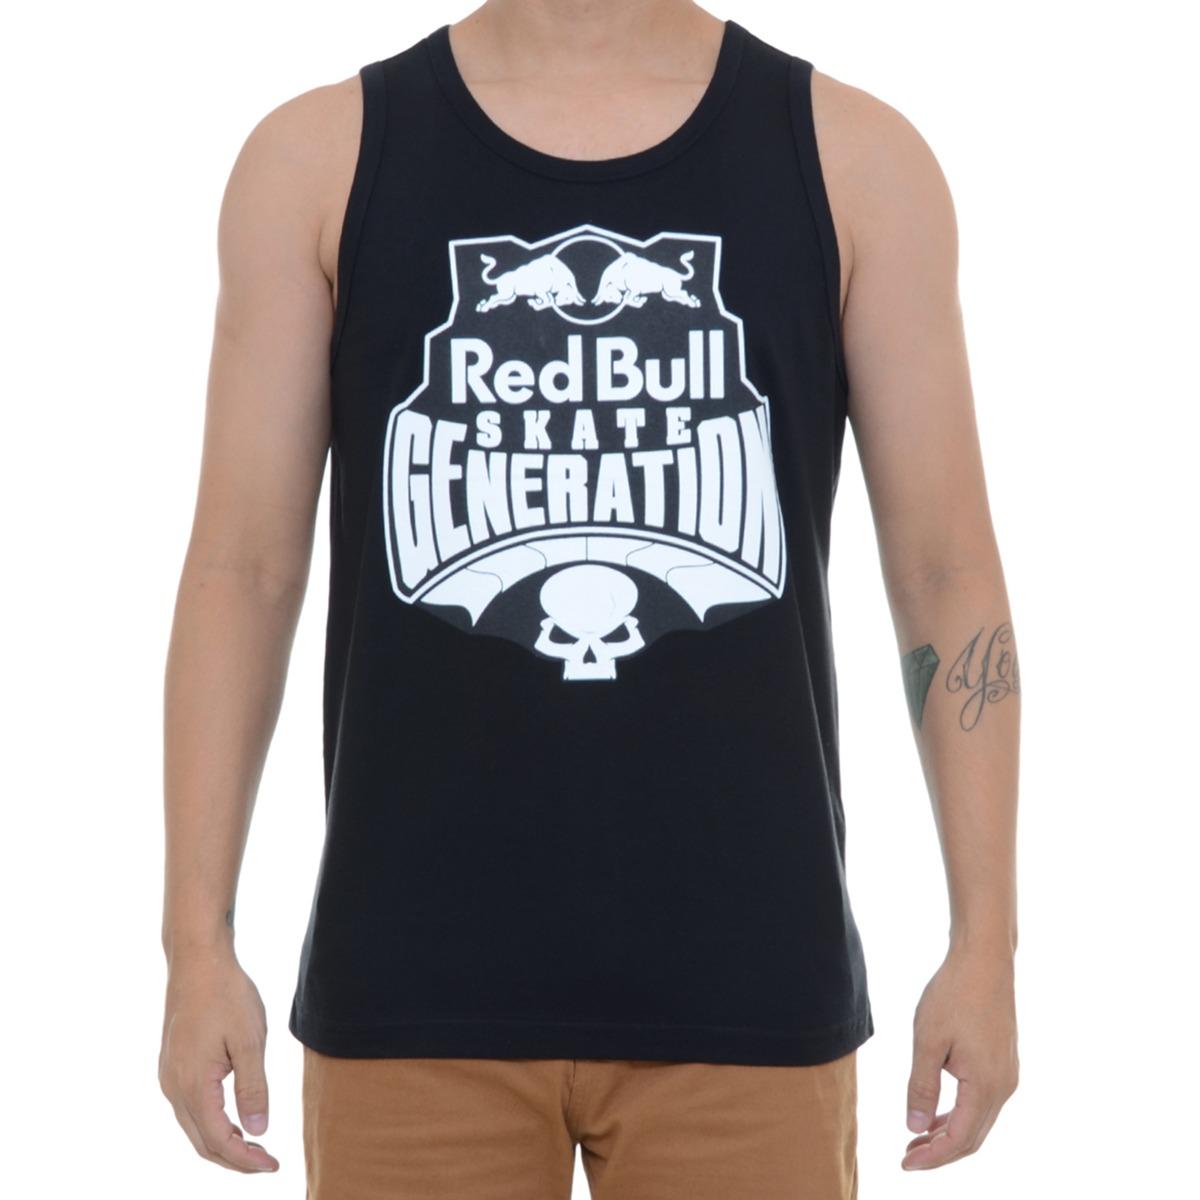 camiseta masculina red bull regata skate generation. Carregando zoom. 6afb76ca76a